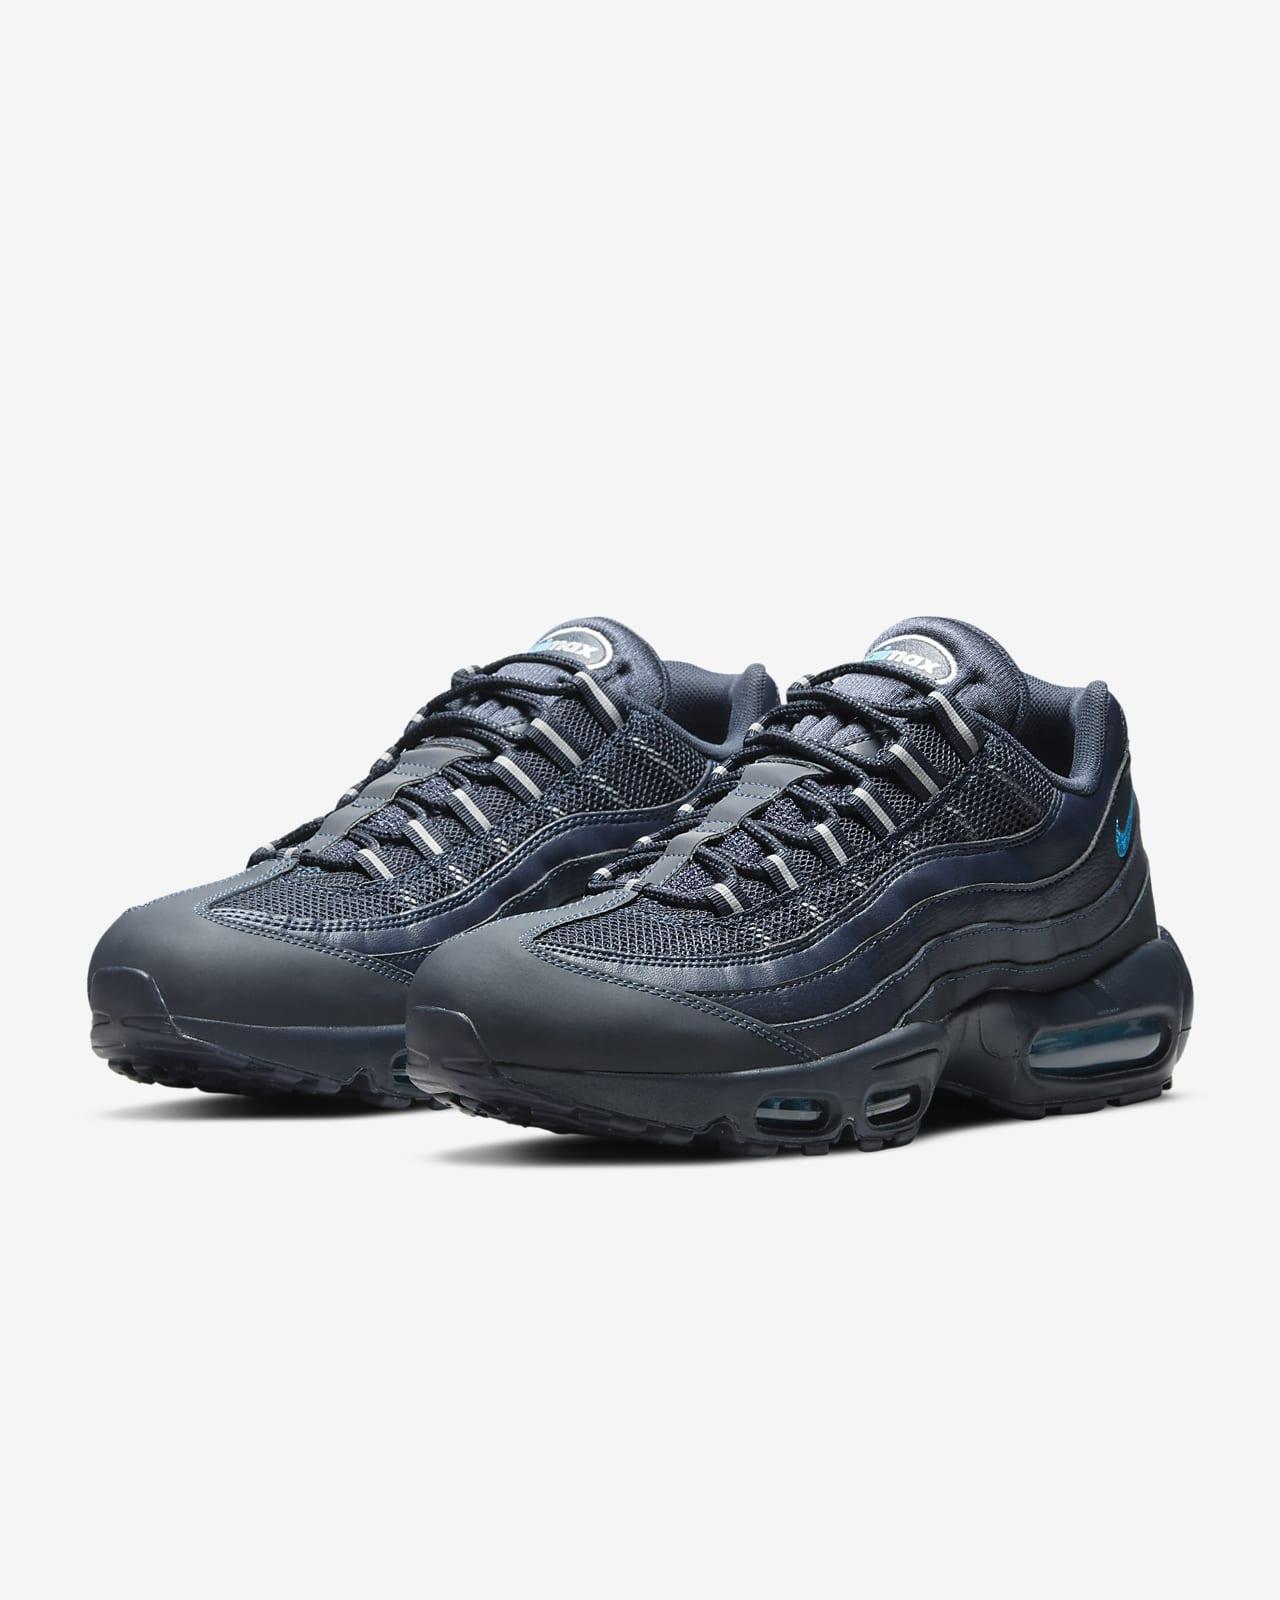 Nike Air Max 95 Essential Men's Shoe